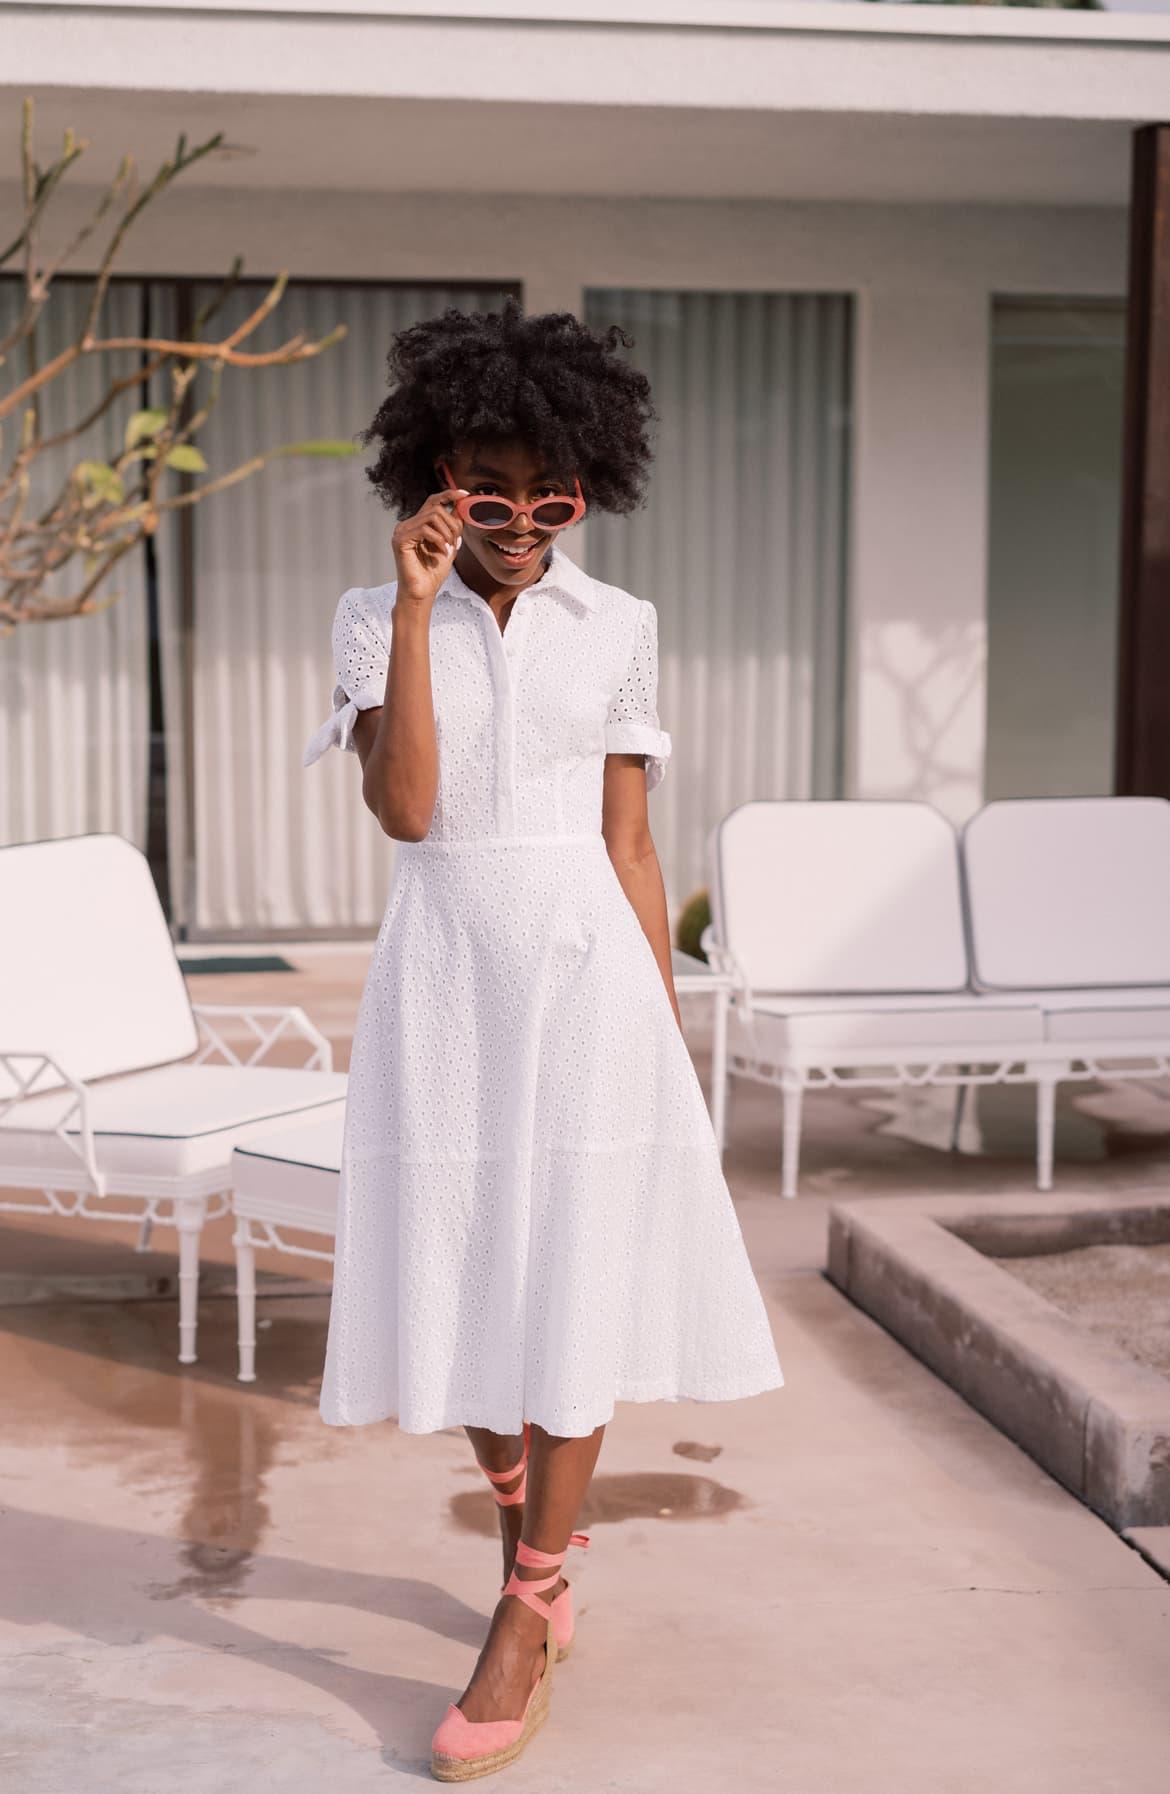 Judith Puff Sleeve Cotton Eyelet Dress